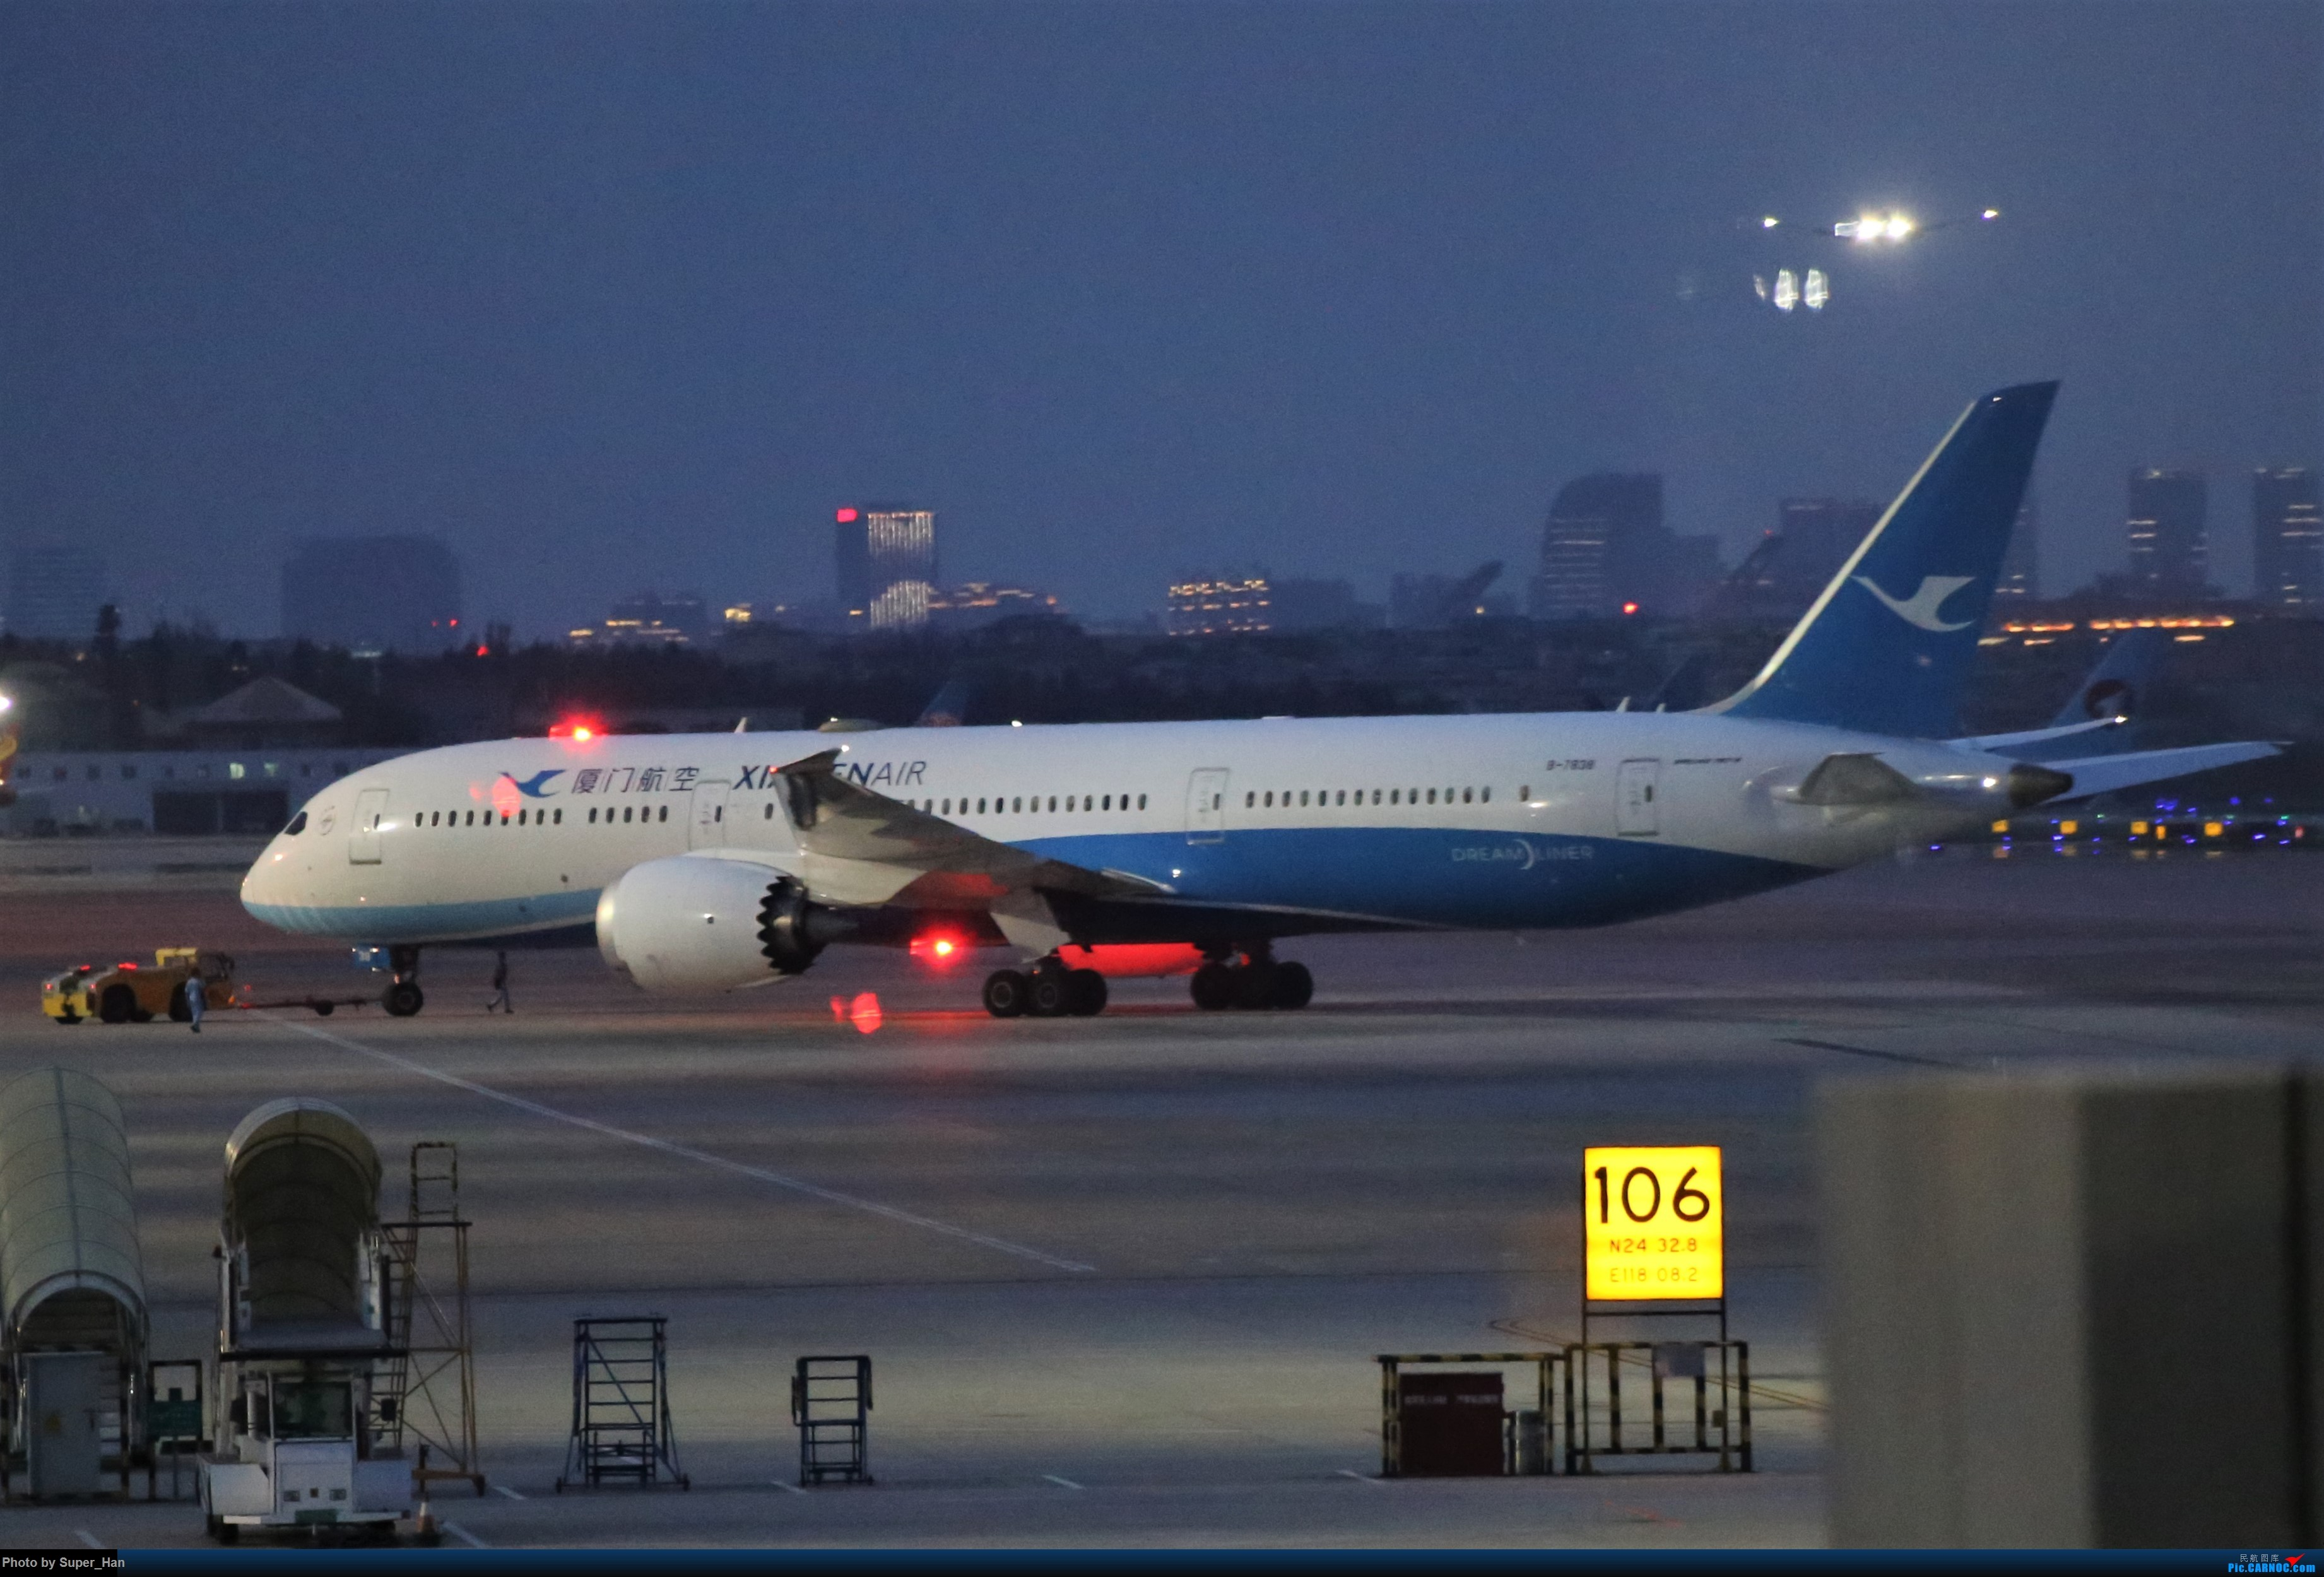 Re:[原创]0831初访XMN BOEING 787-9 B-7838 中国厦门高崎国际机场